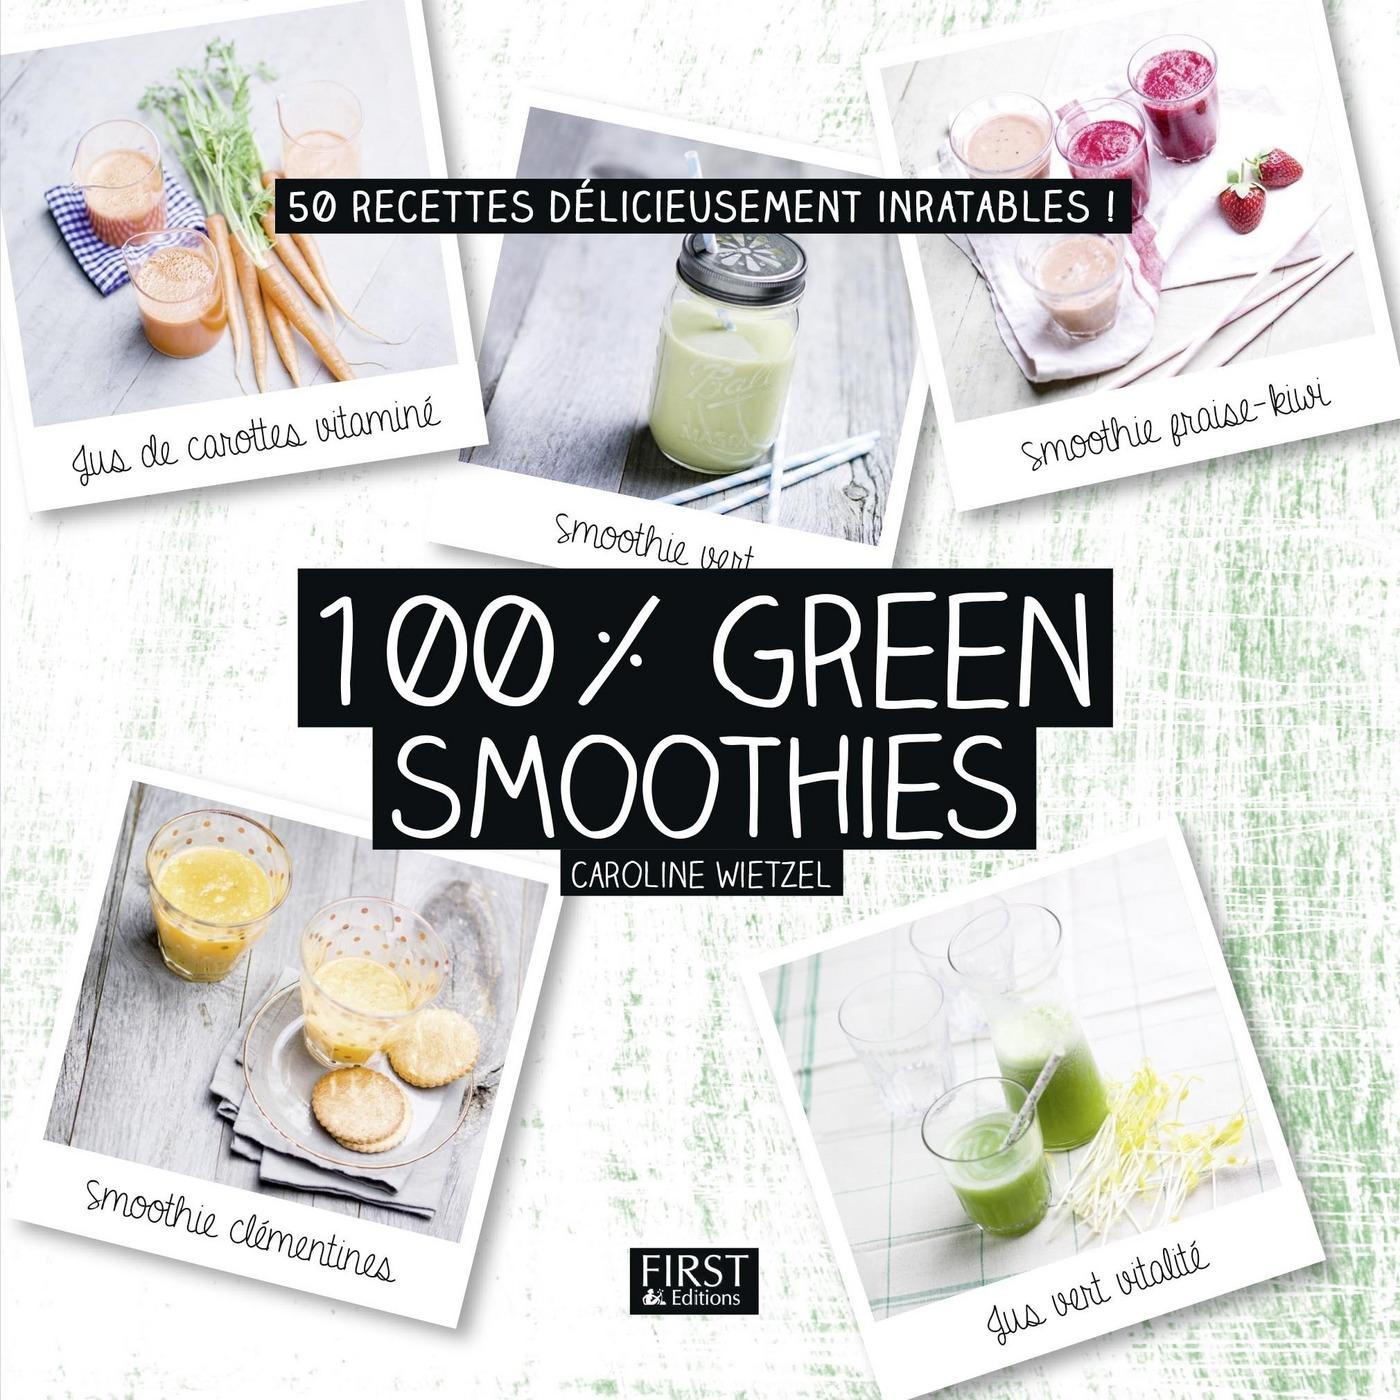 100 % green smoothies (ebook)